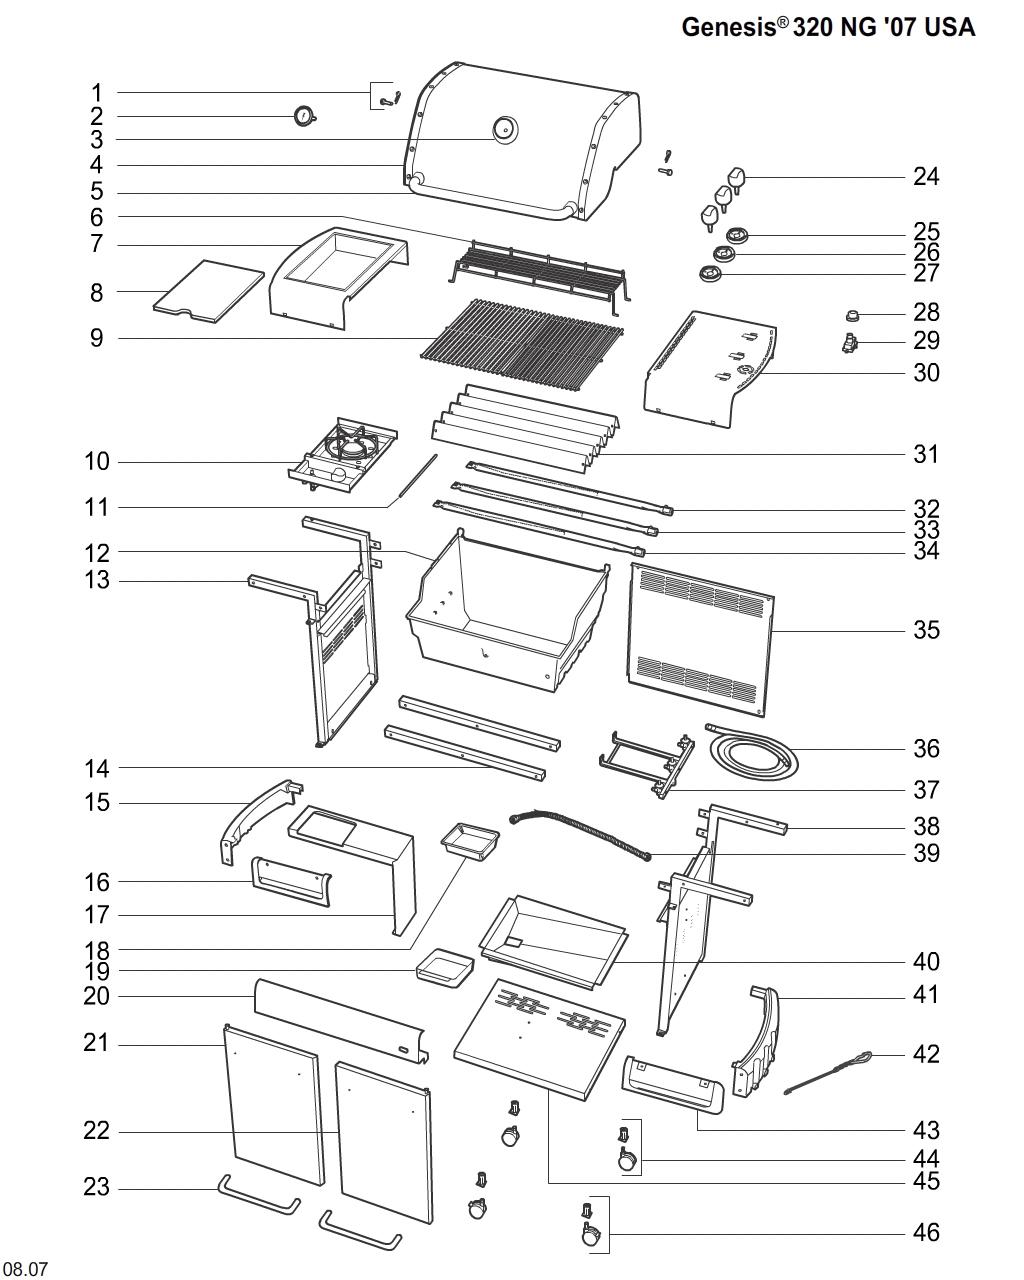 Schematic Image 3880001